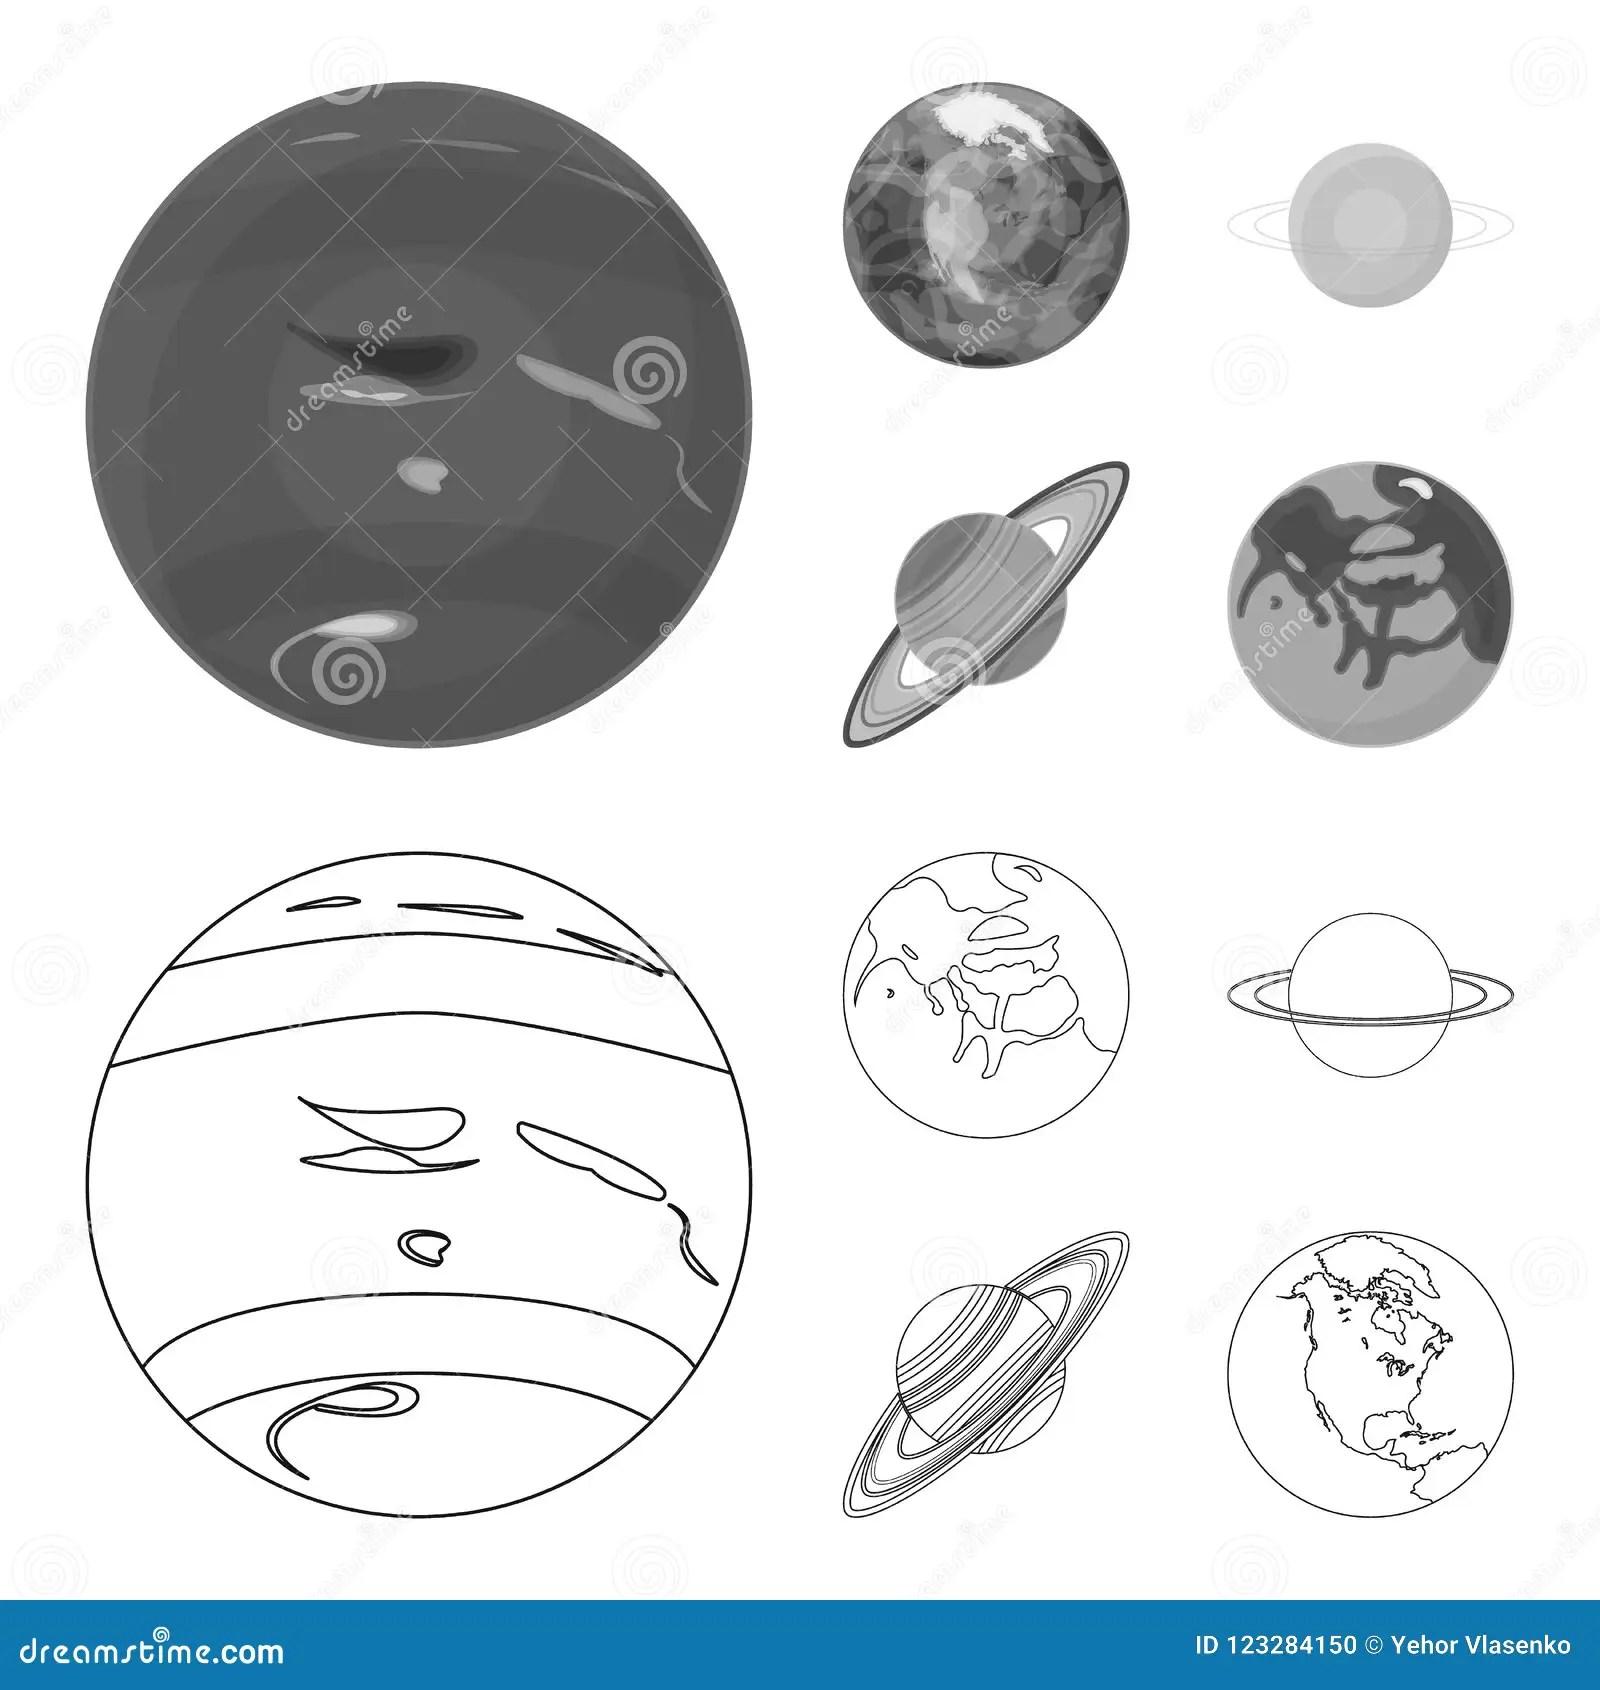 Neptune Mars Saturn Urof The Solar System Planets